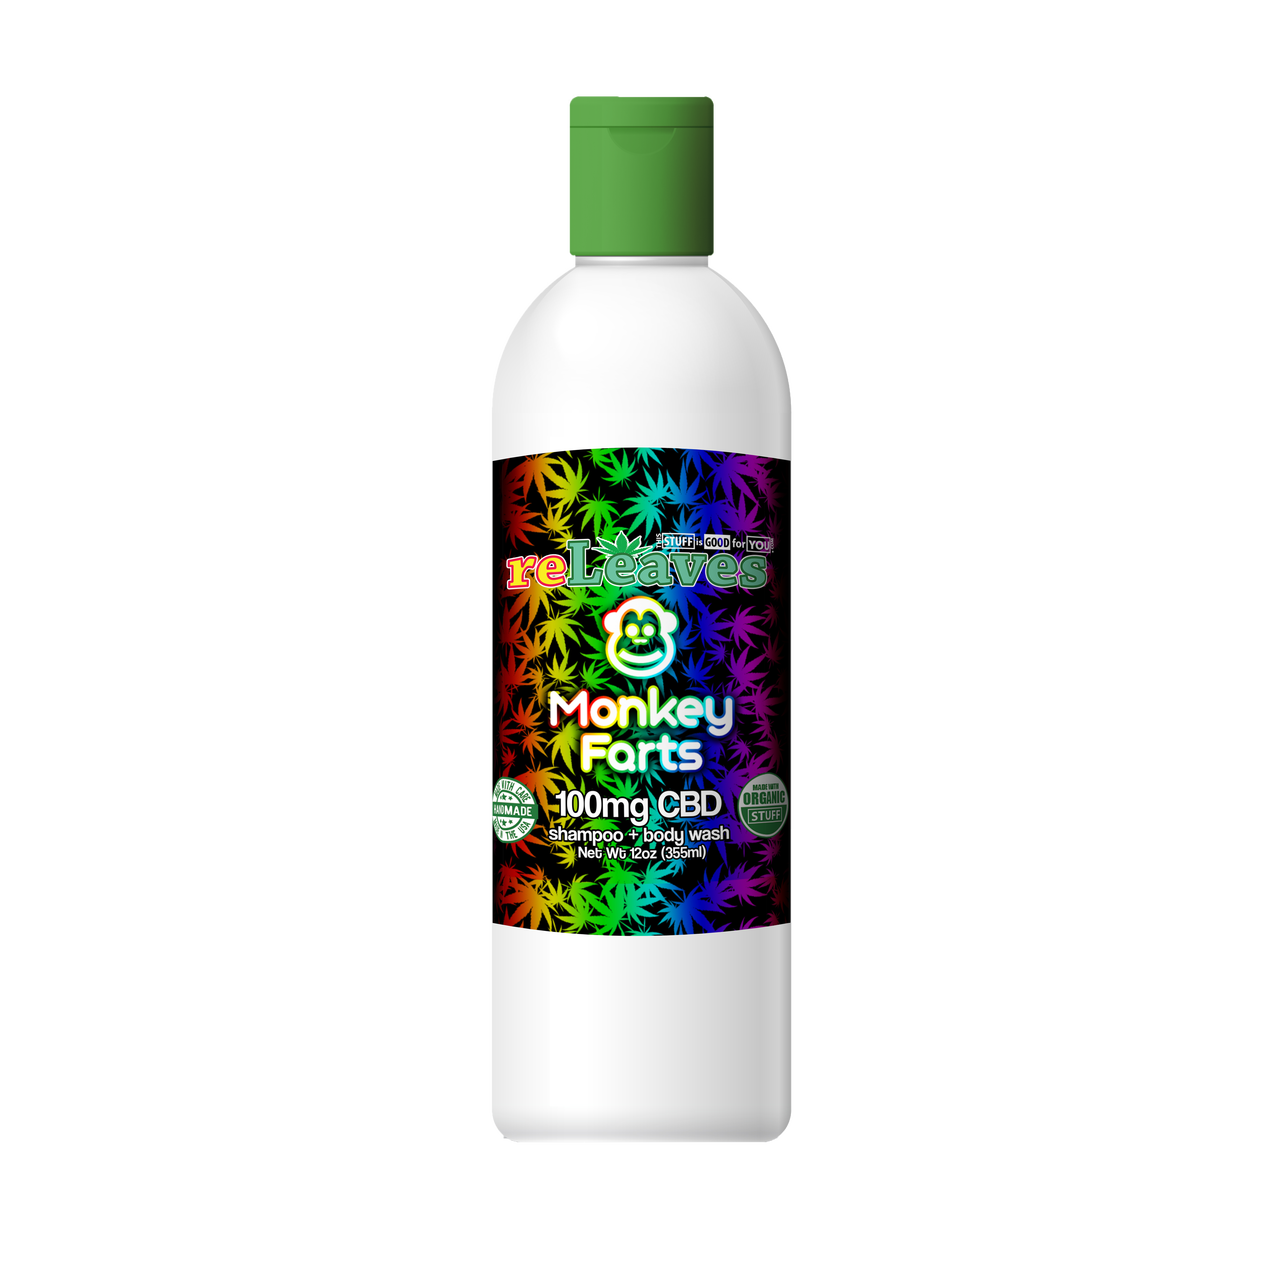 12oz reLeaves 100mg CBD Monkey Farts Shampoo Body Wash